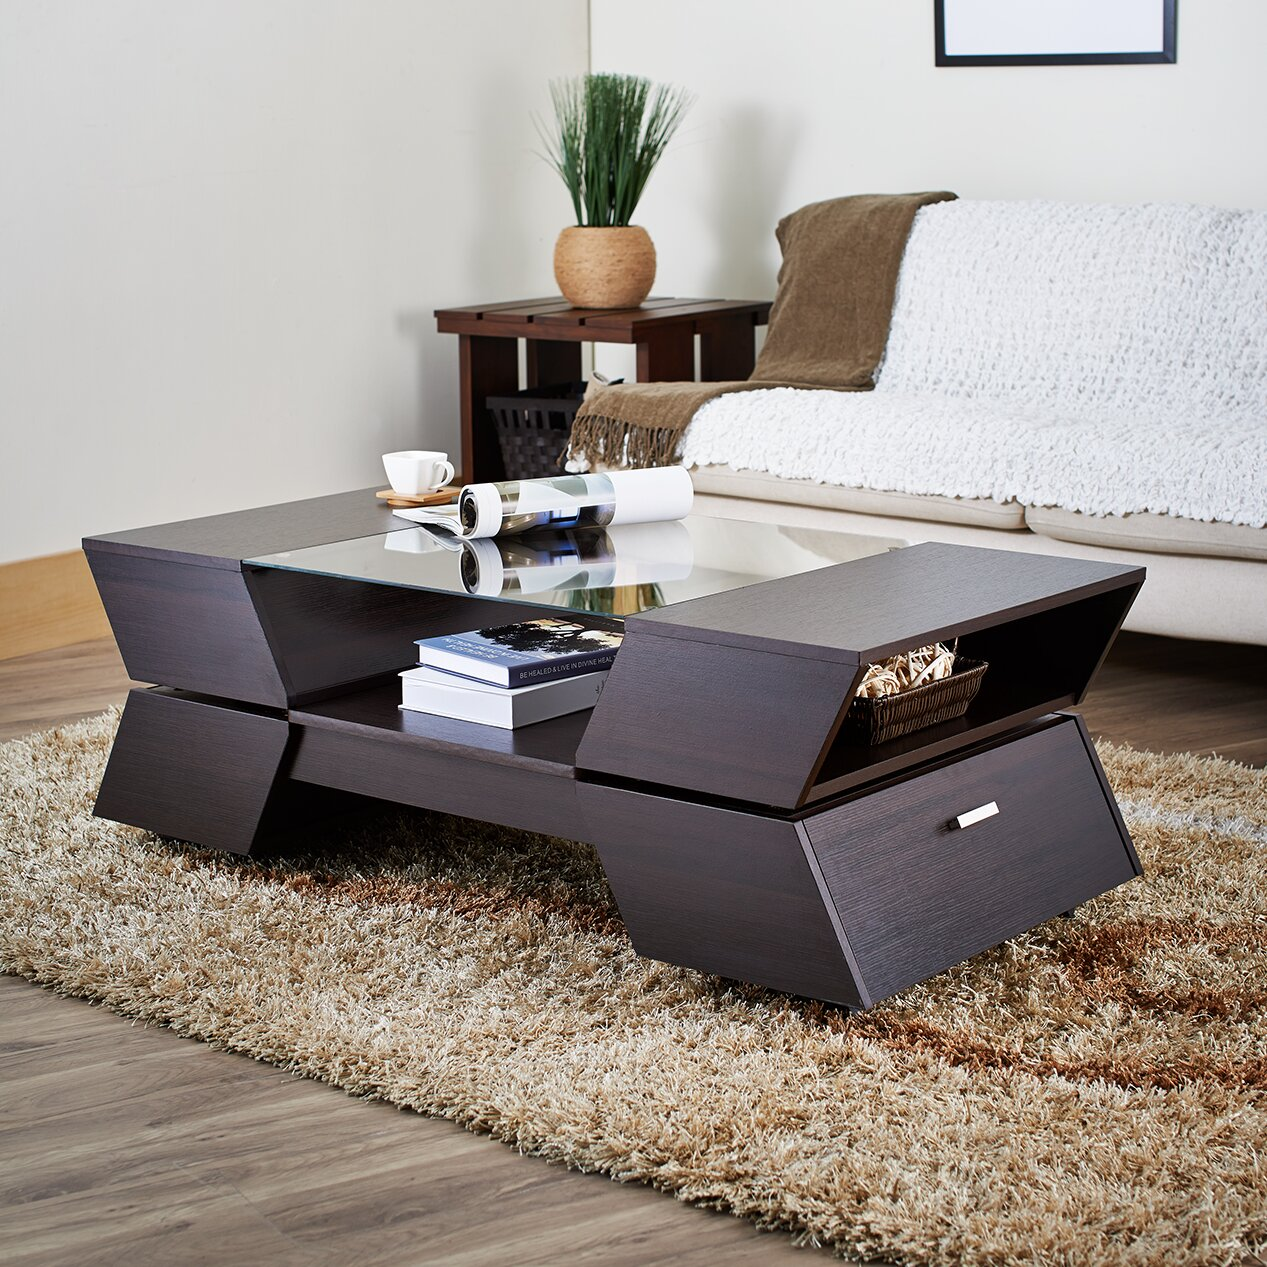 hokku designs matias coffee table reviews. Black Bedroom Furniture Sets. Home Design Ideas